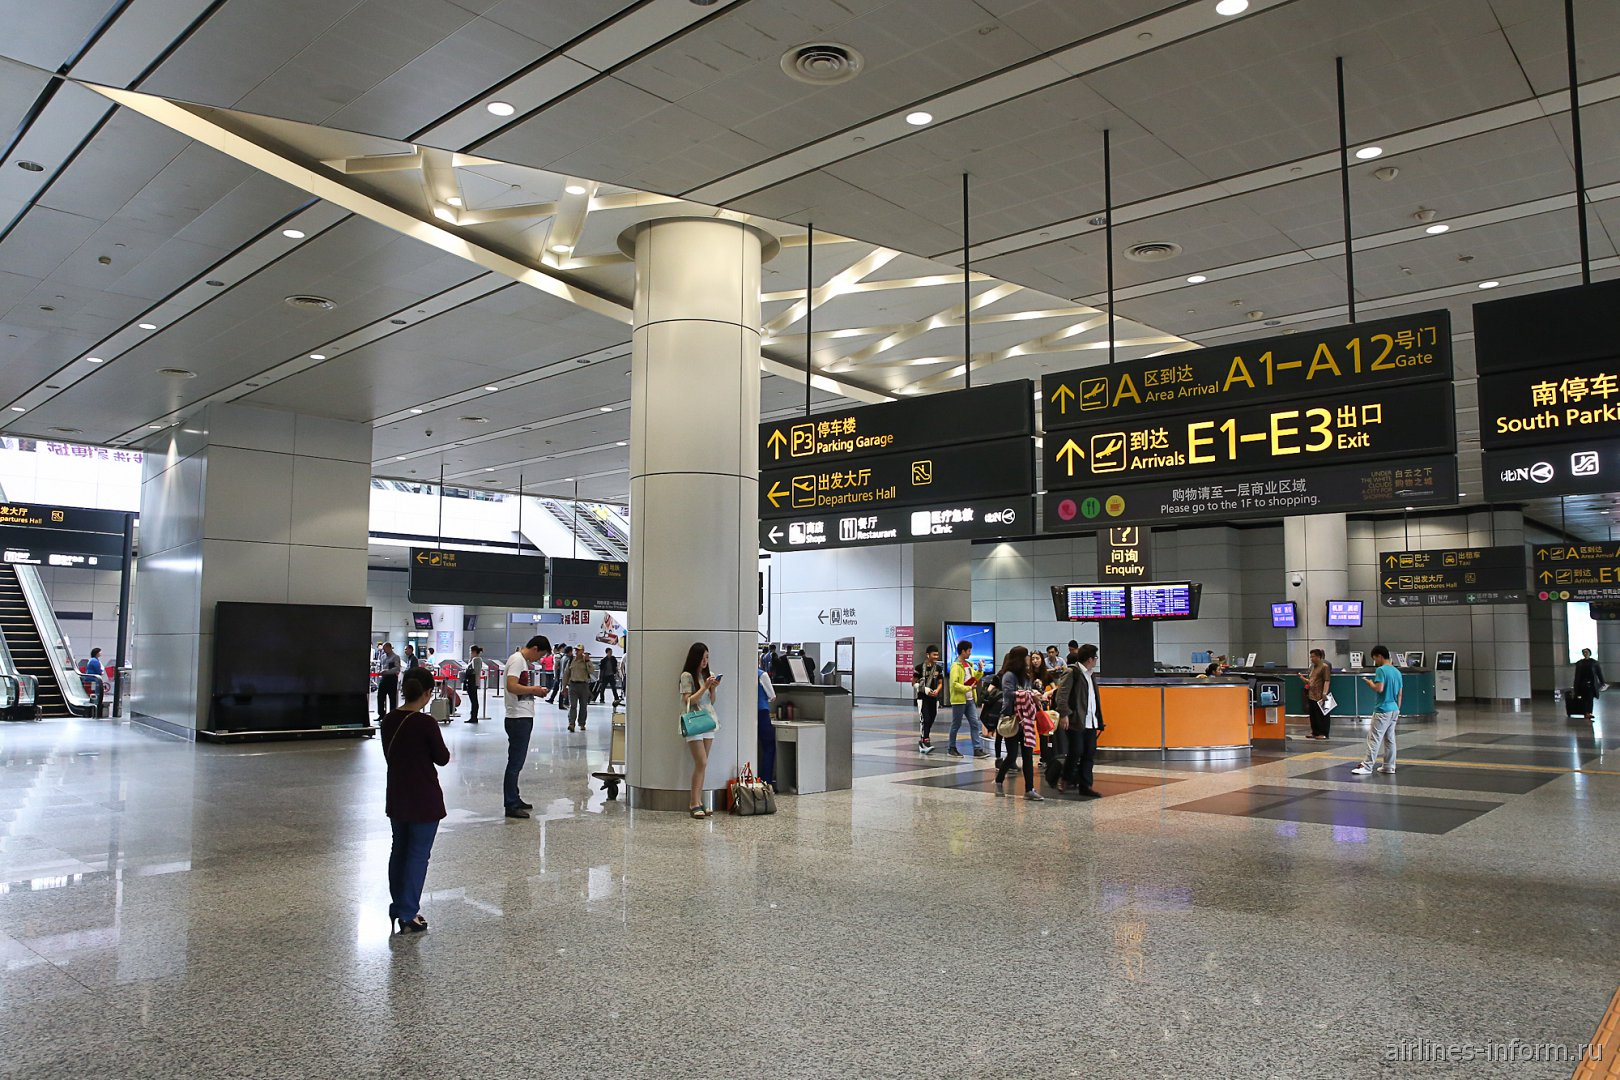 В зоне прилета аэропорта Гуанчжоу Байюнь